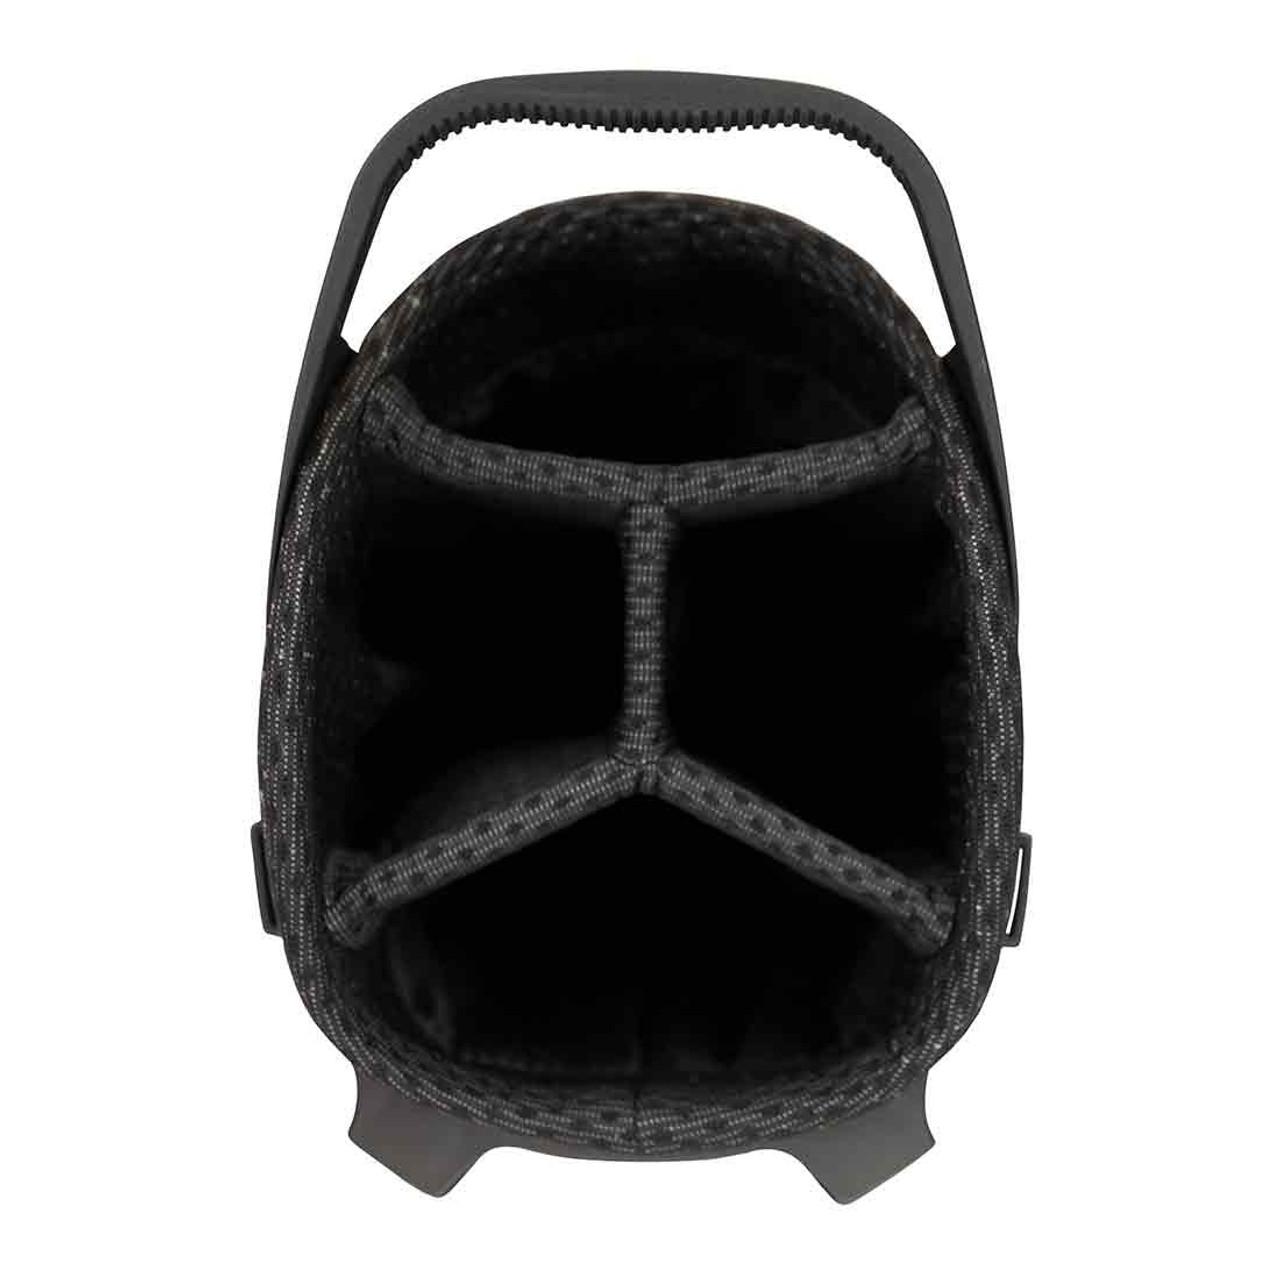 Burton ULT Carry Bag